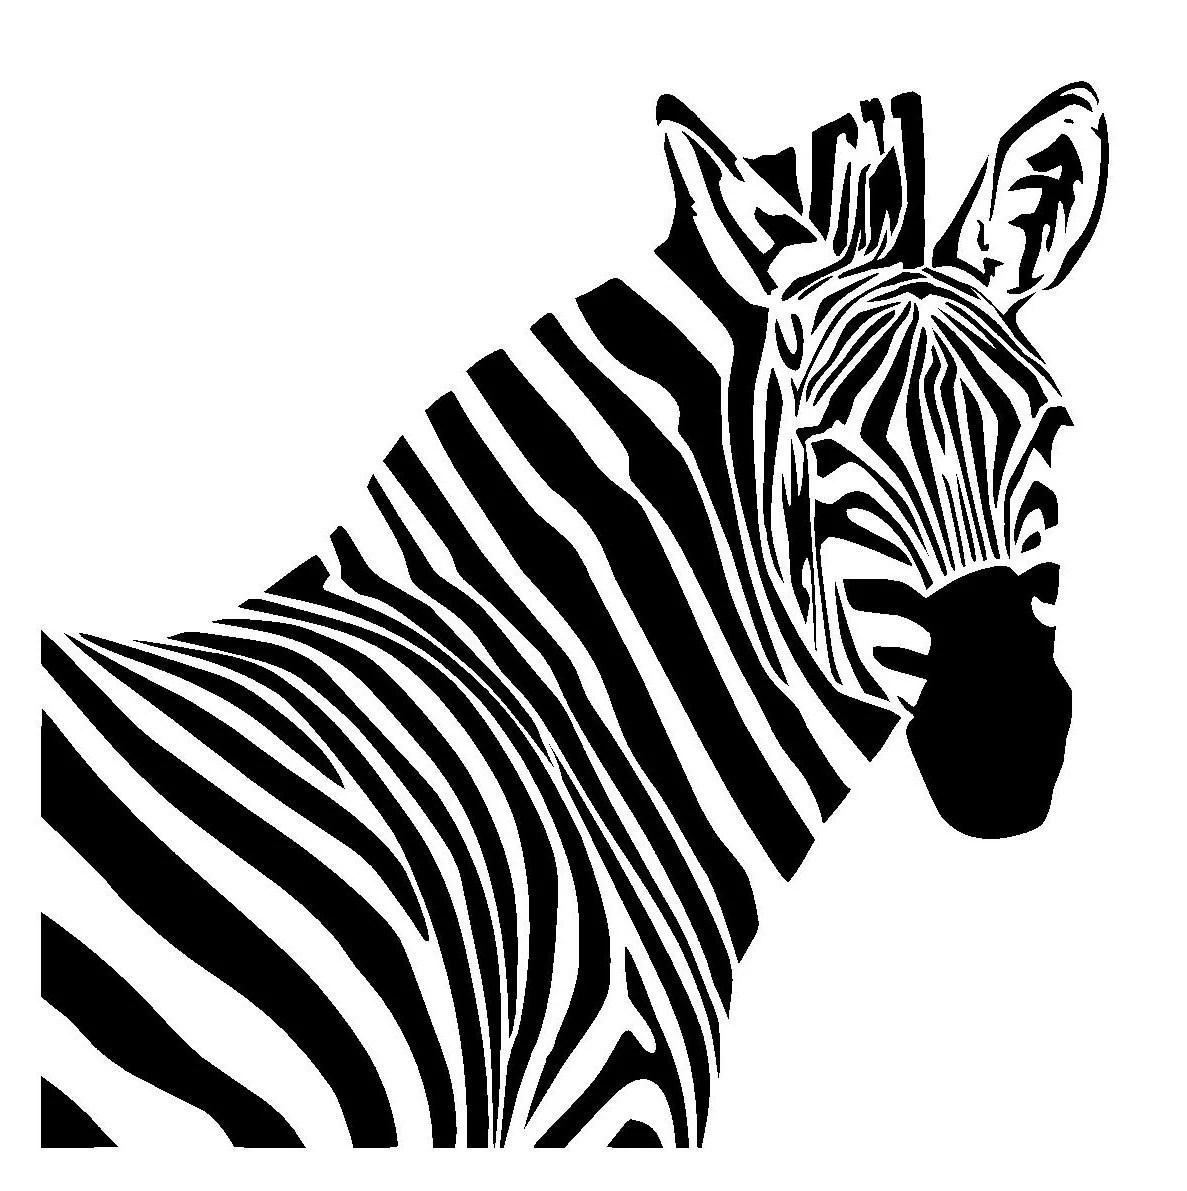 6 6 Zebra Stencil 1